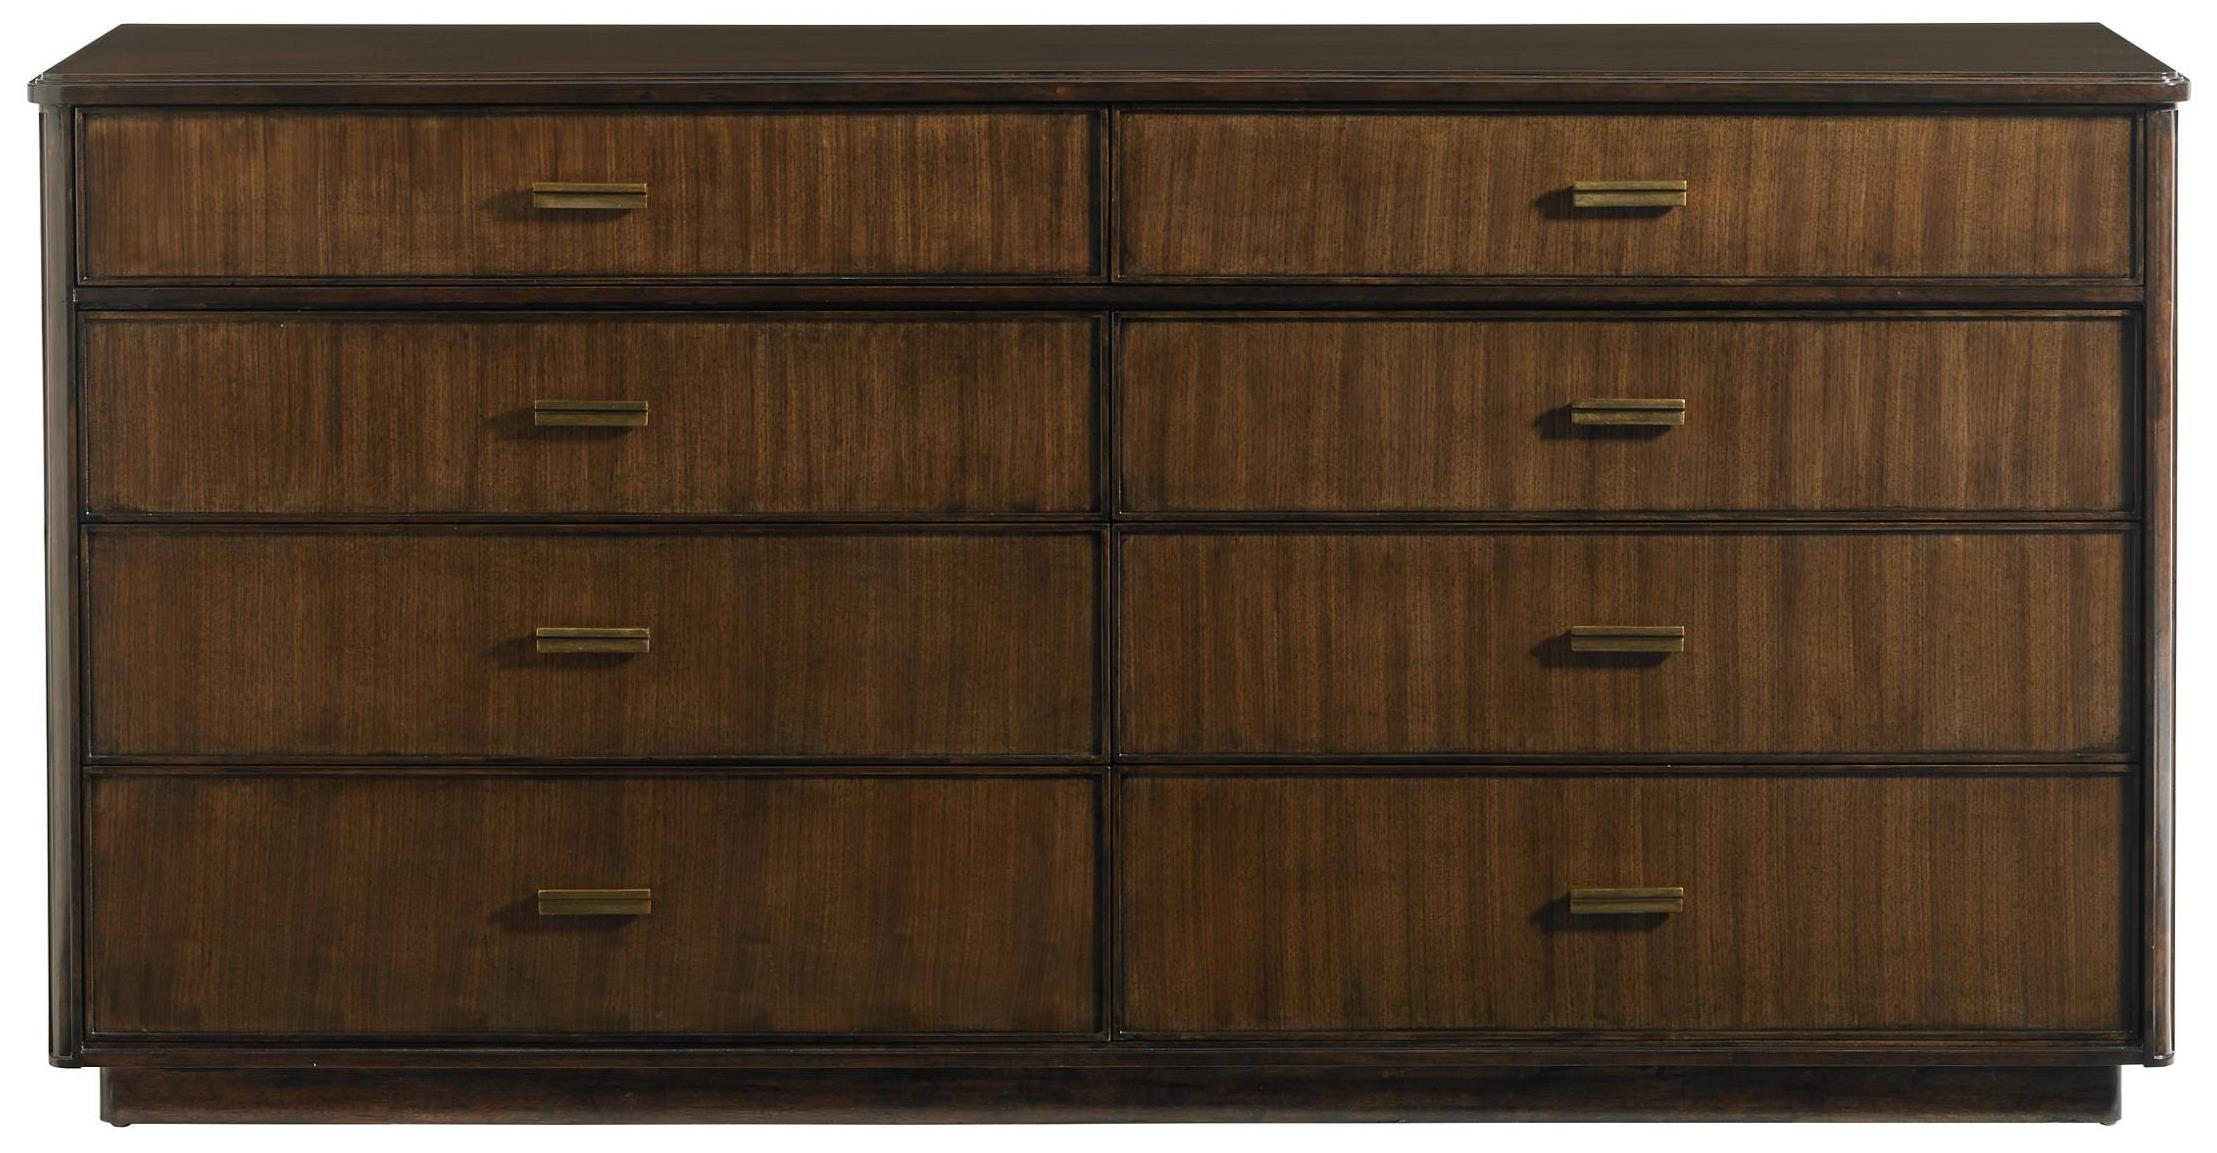 Stanley Furniture Crestaire Southridge Dresser - Item Number: 436-13-06